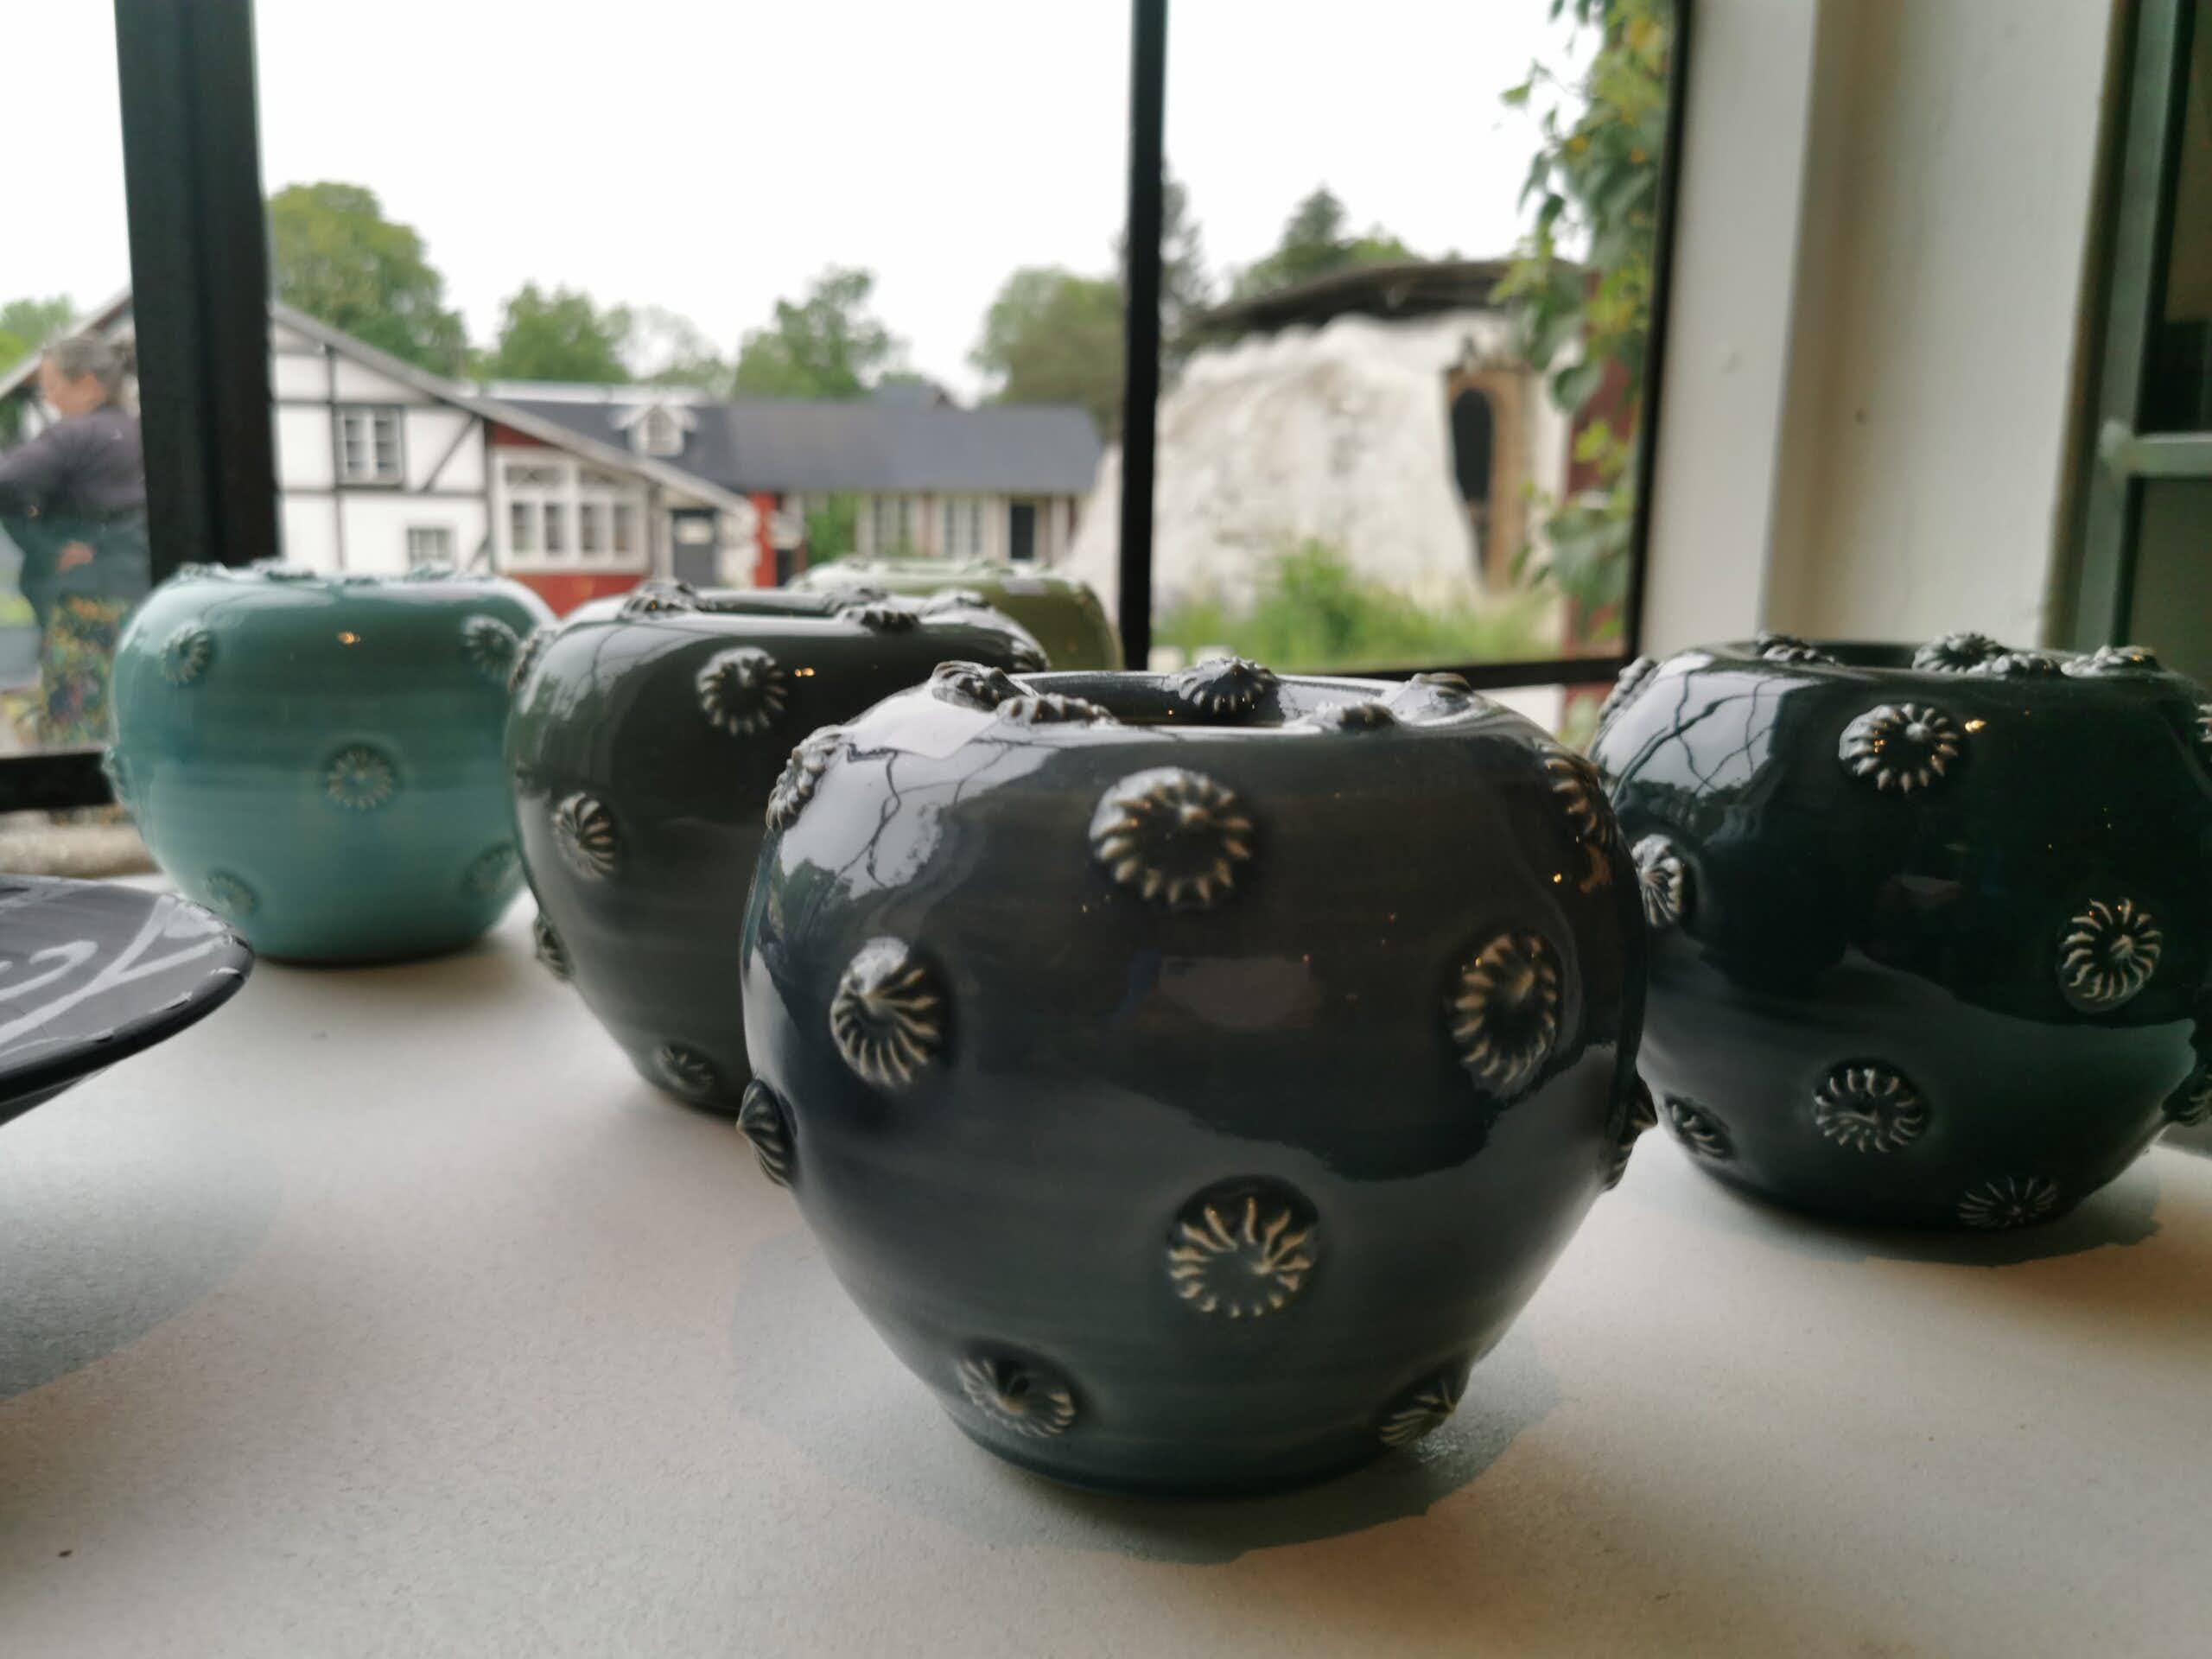 Keramik från Etelhems krukmakeri.